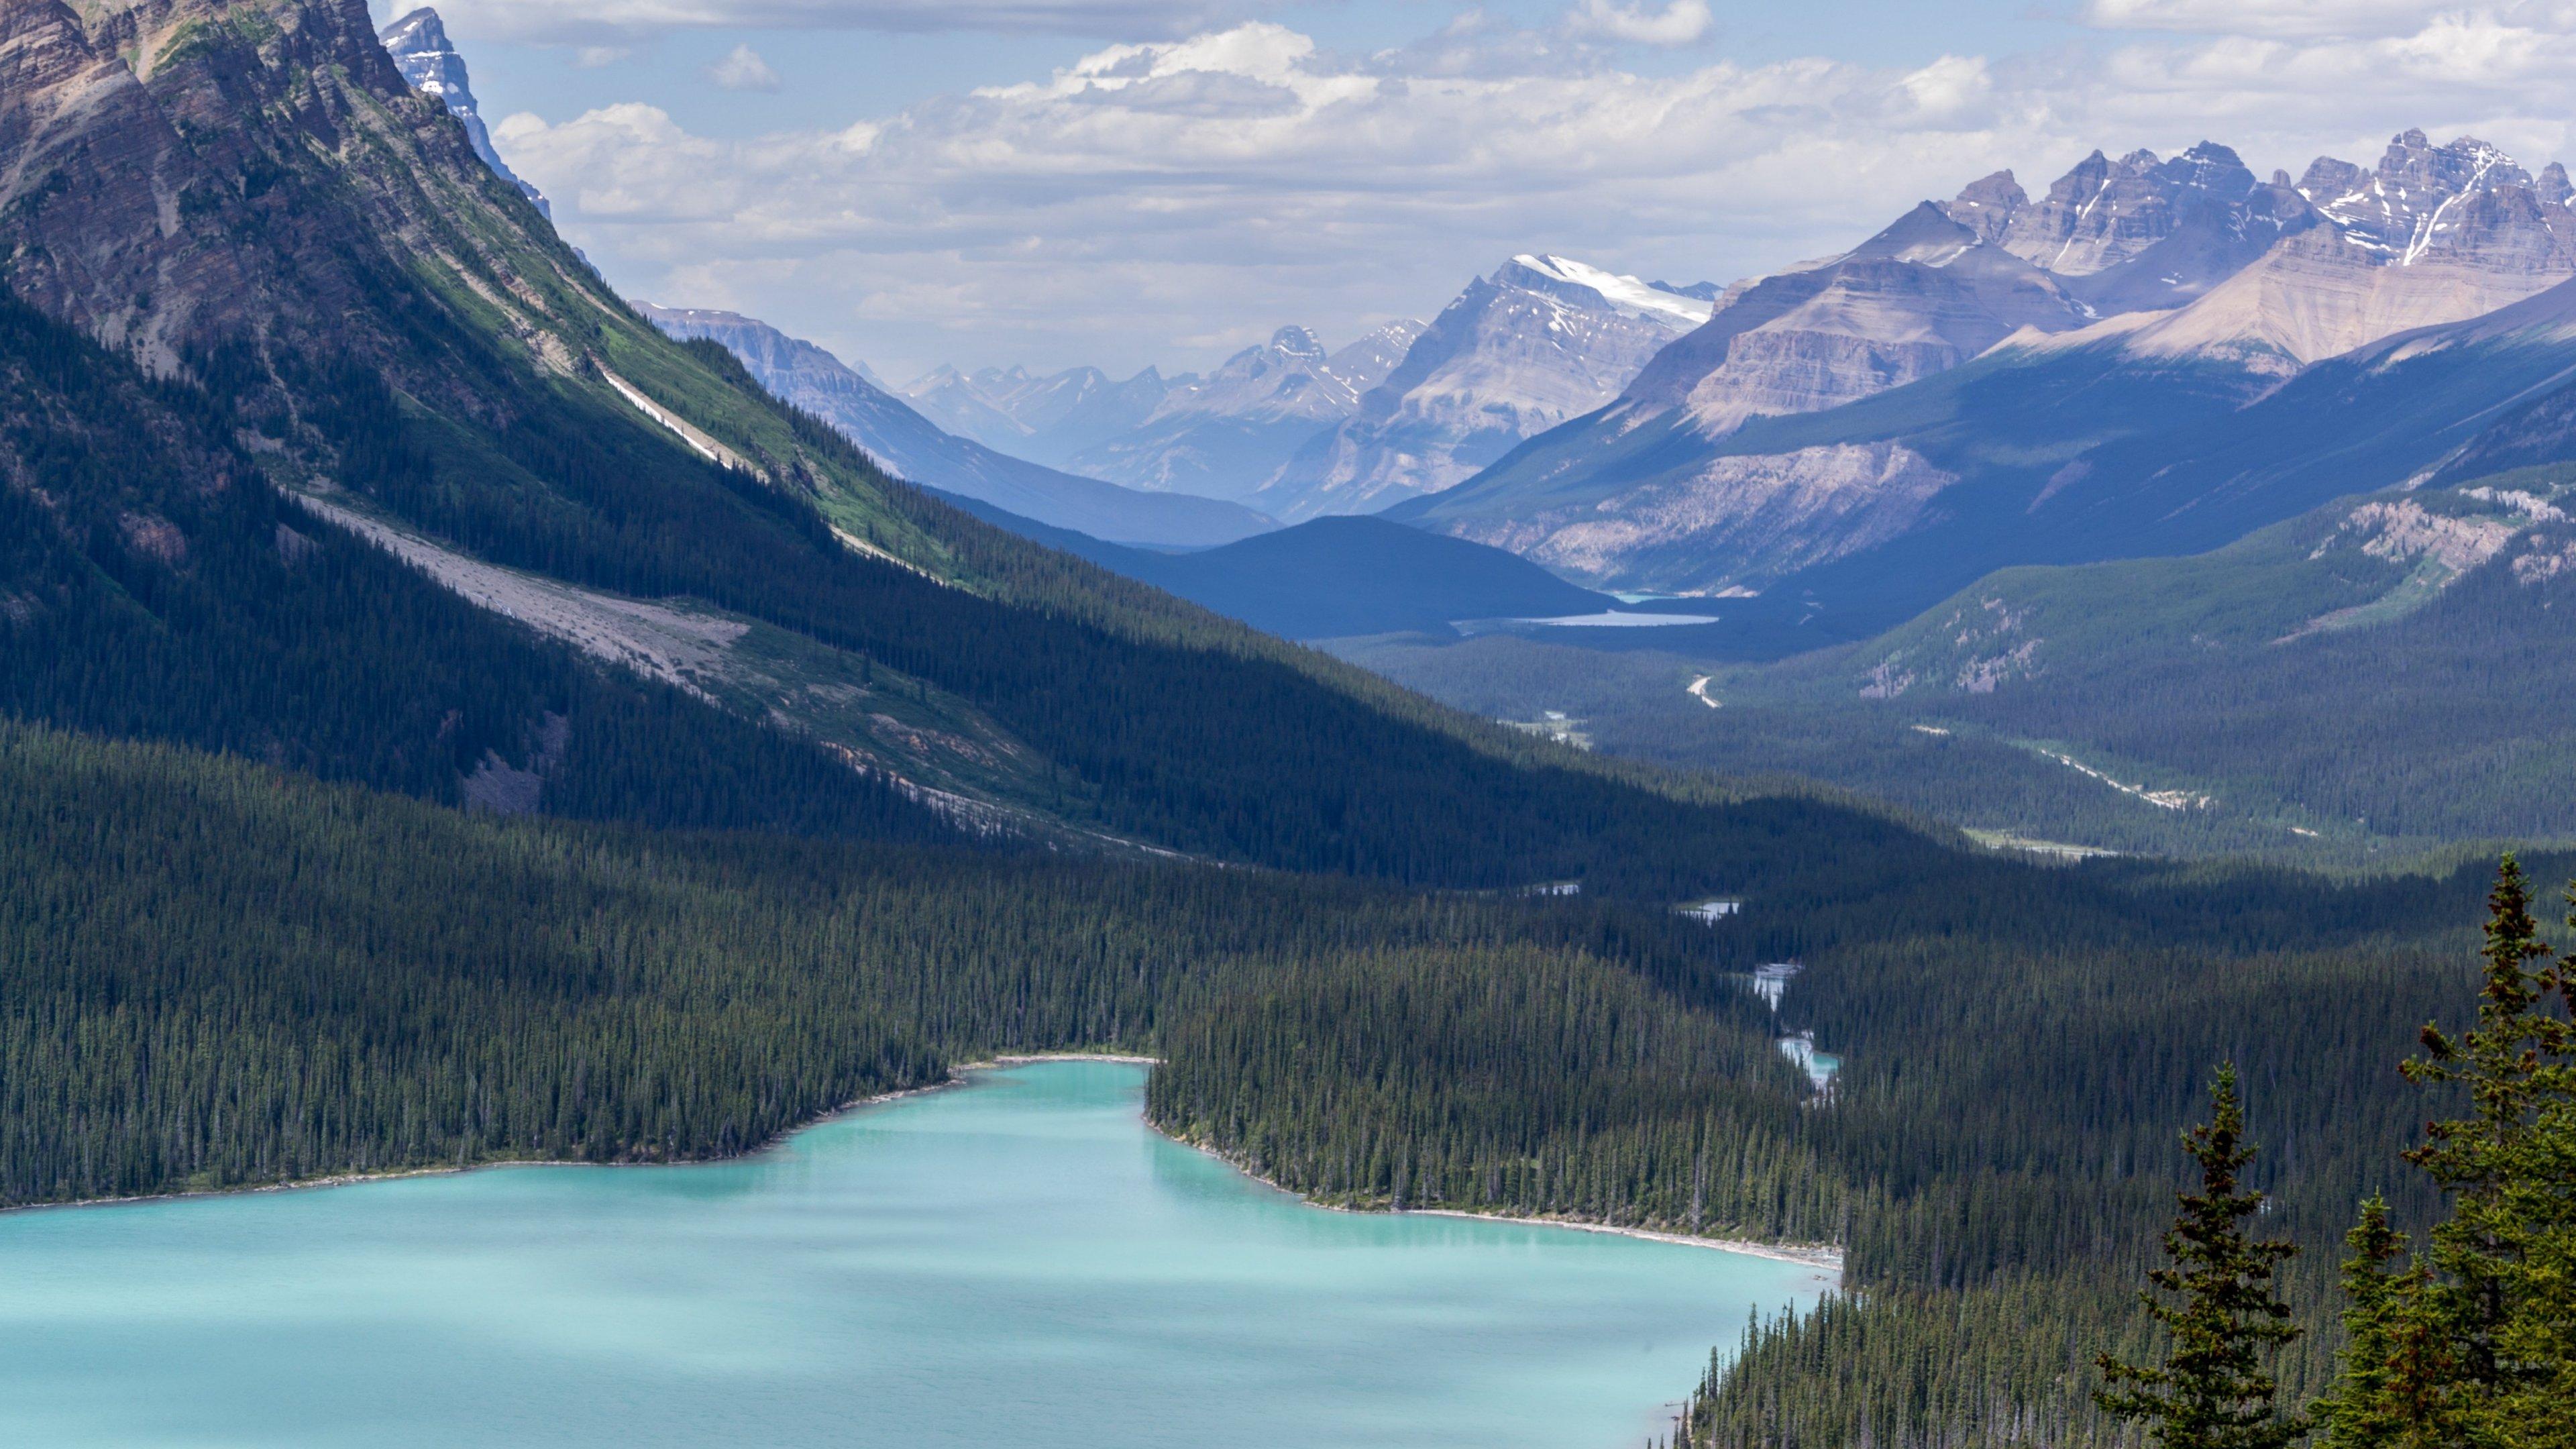 Mountain River Wallpaper Mobile Desktop Background